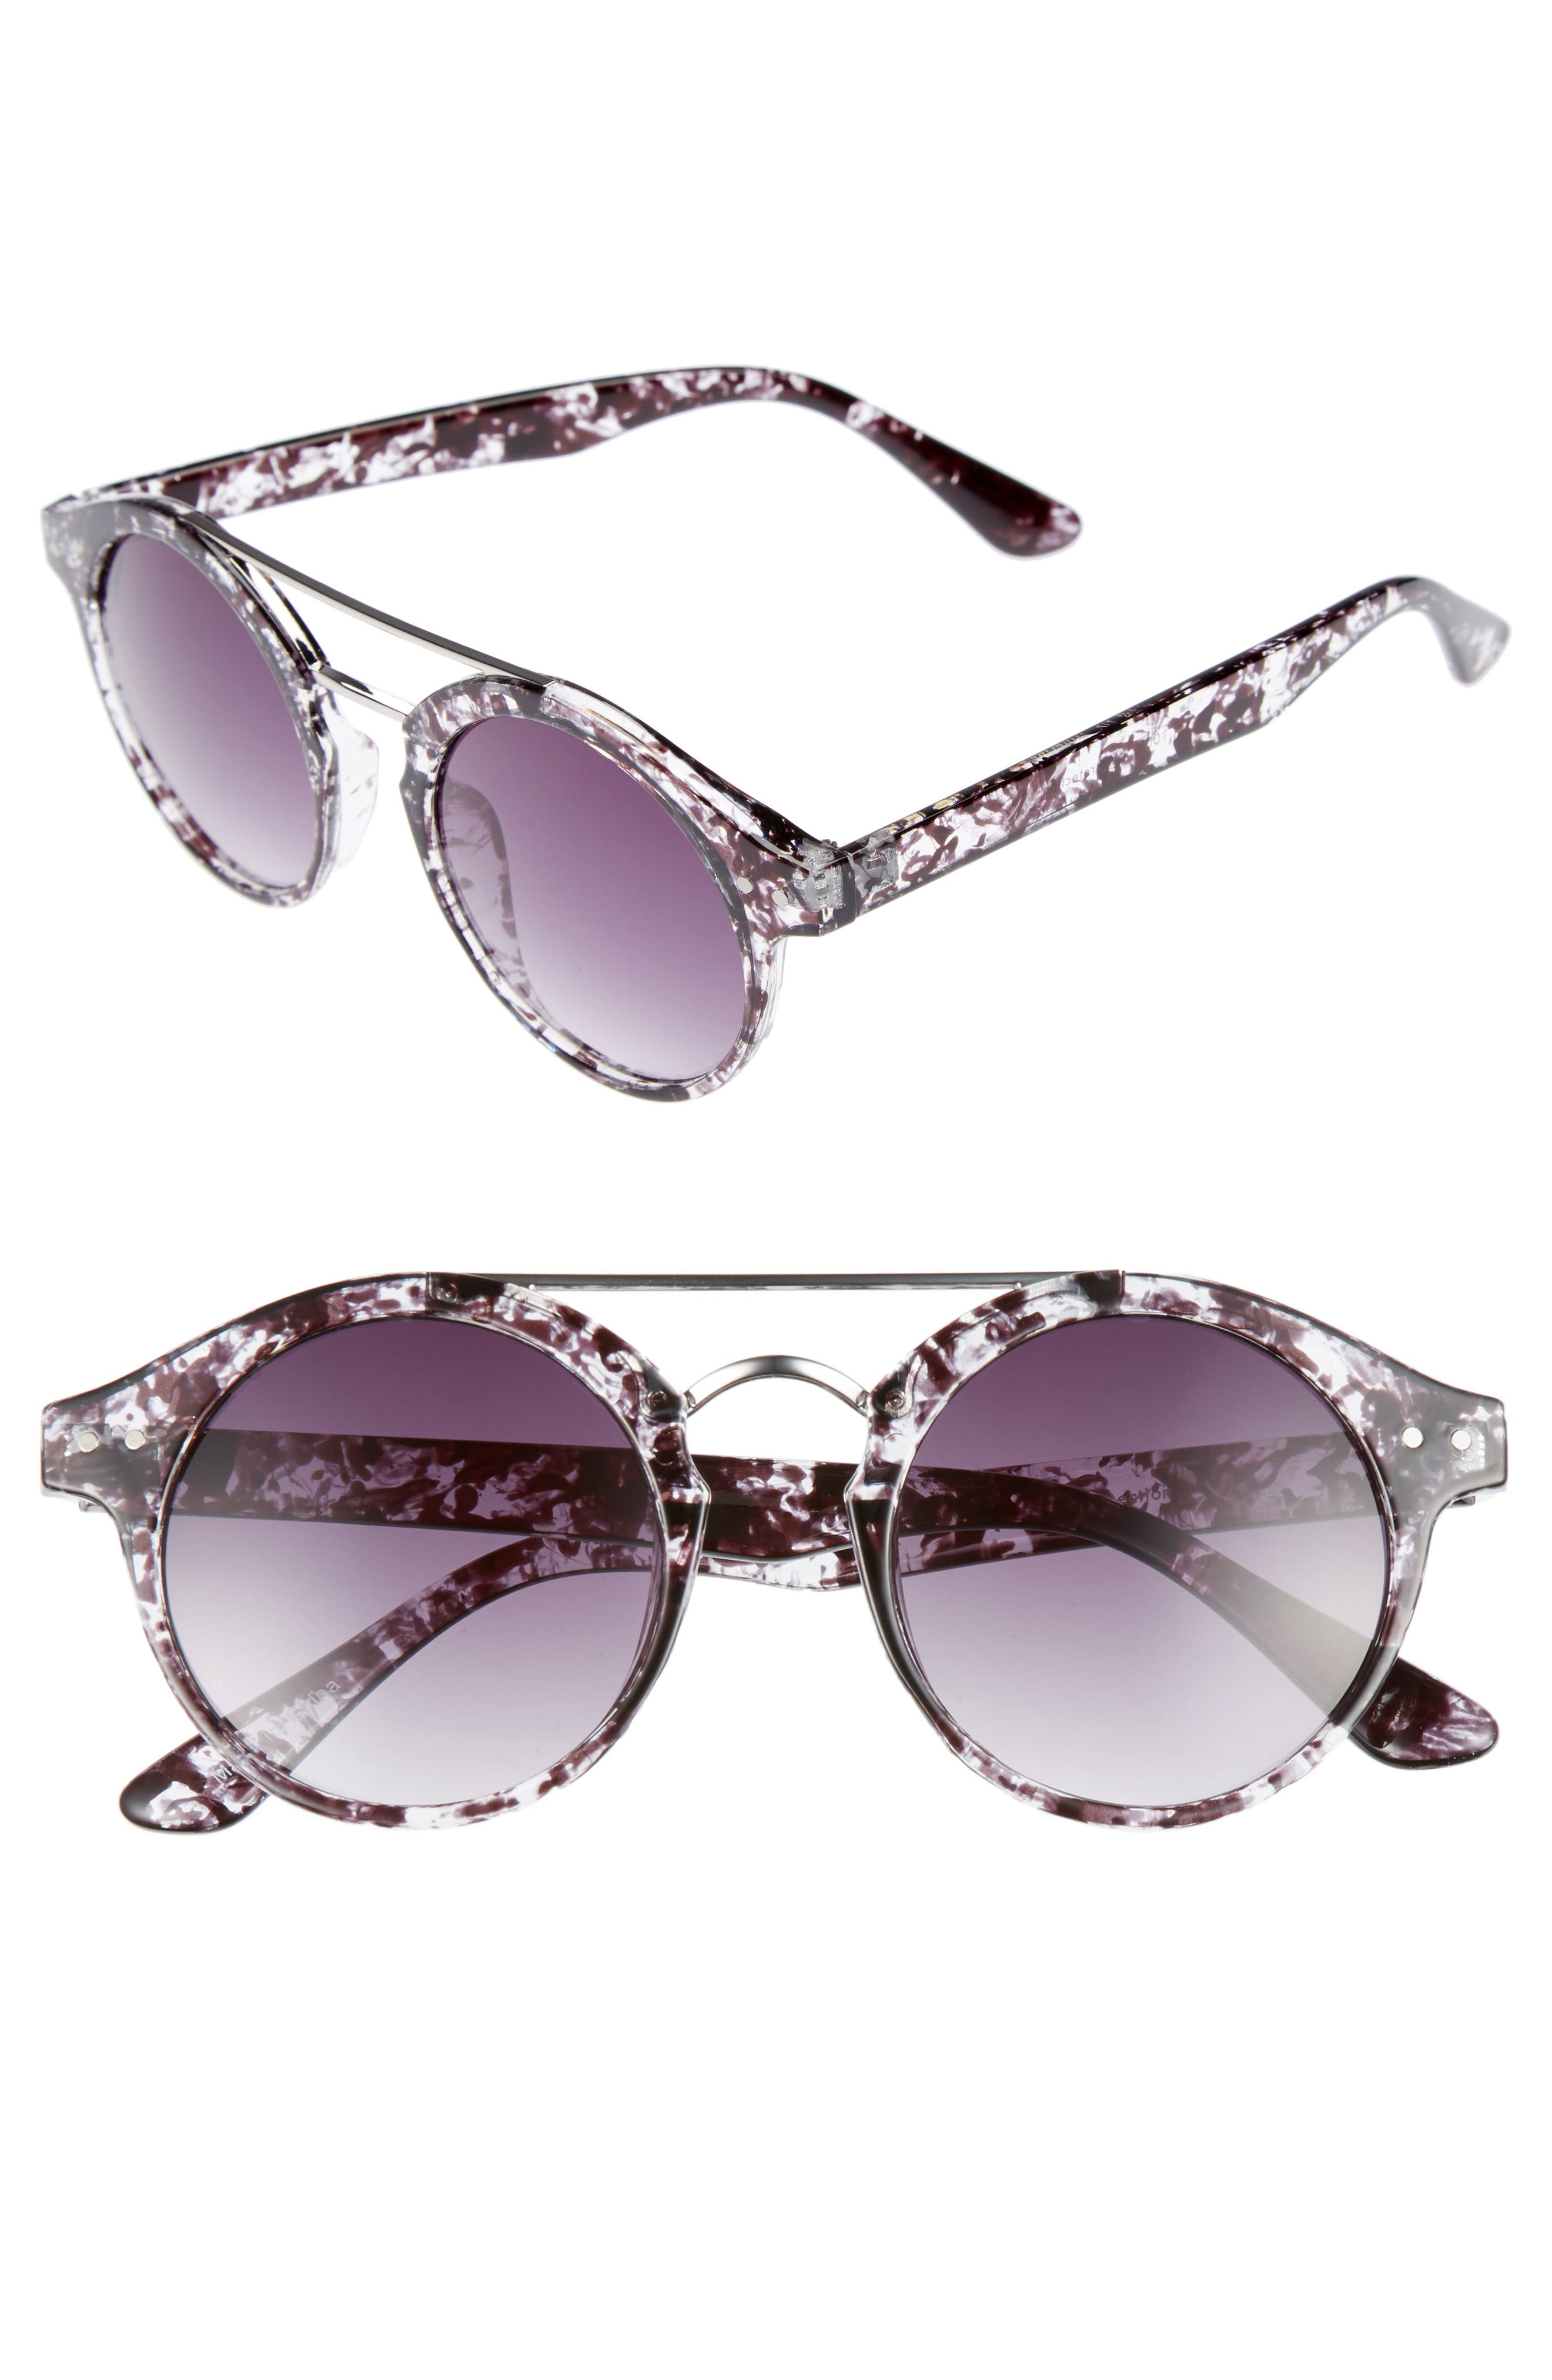 45mm Round Sunglasses,                             Main thumbnail 1, color,                             001